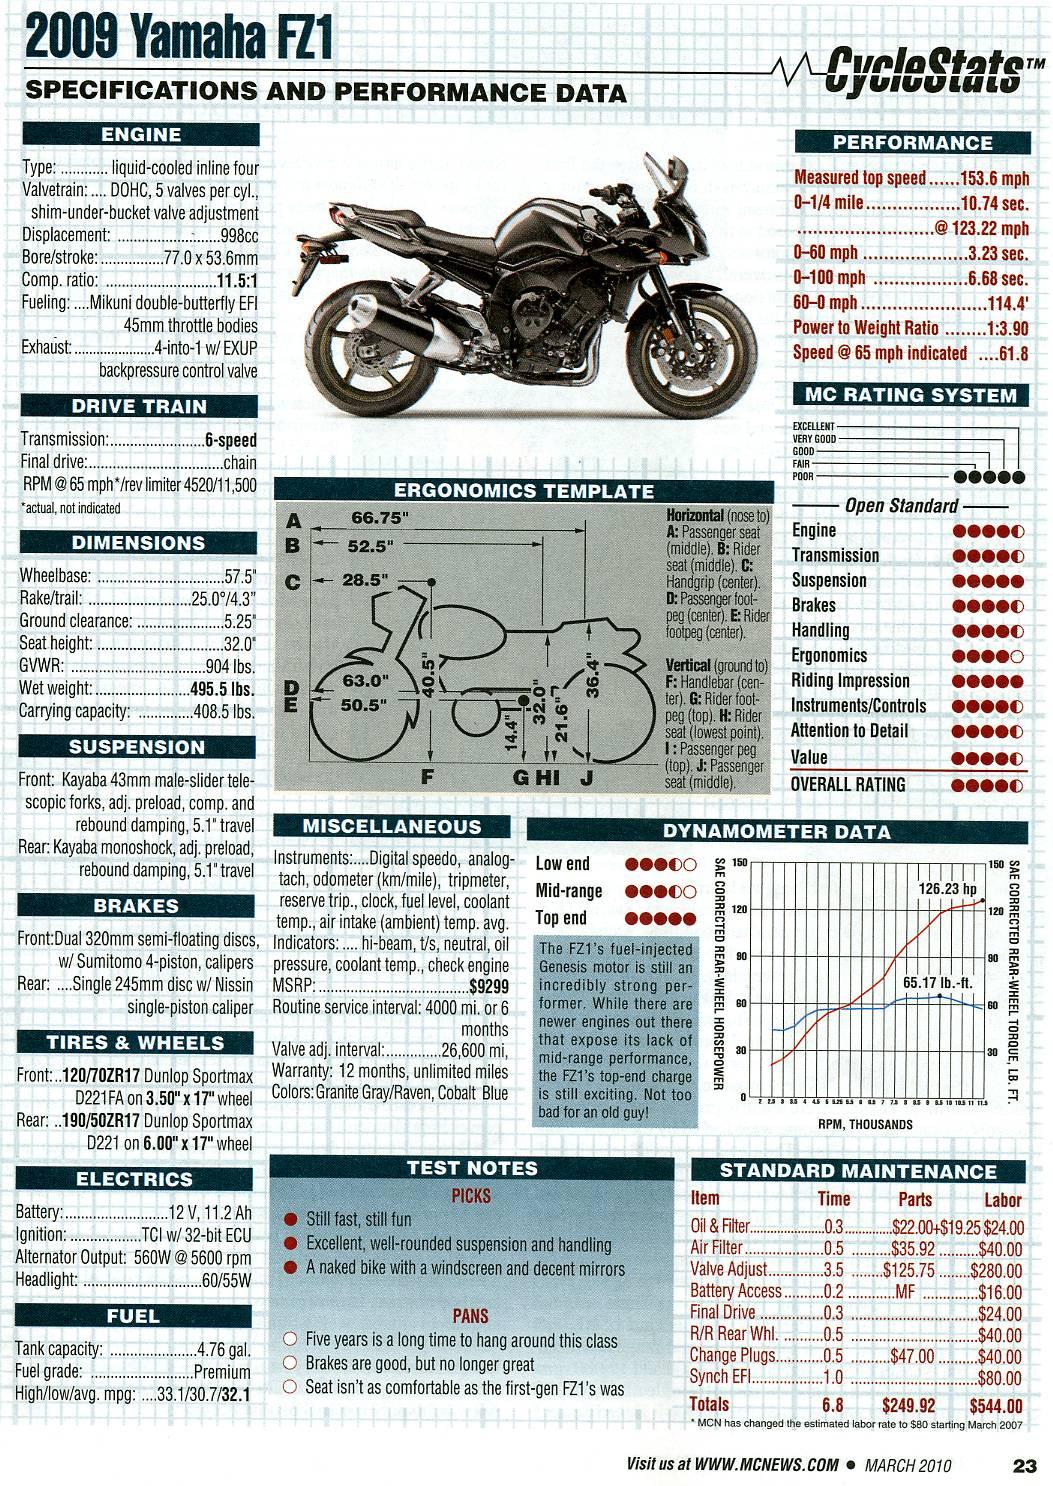 Yamaha R1 top speed run - 187 mph - Sportbikes.net